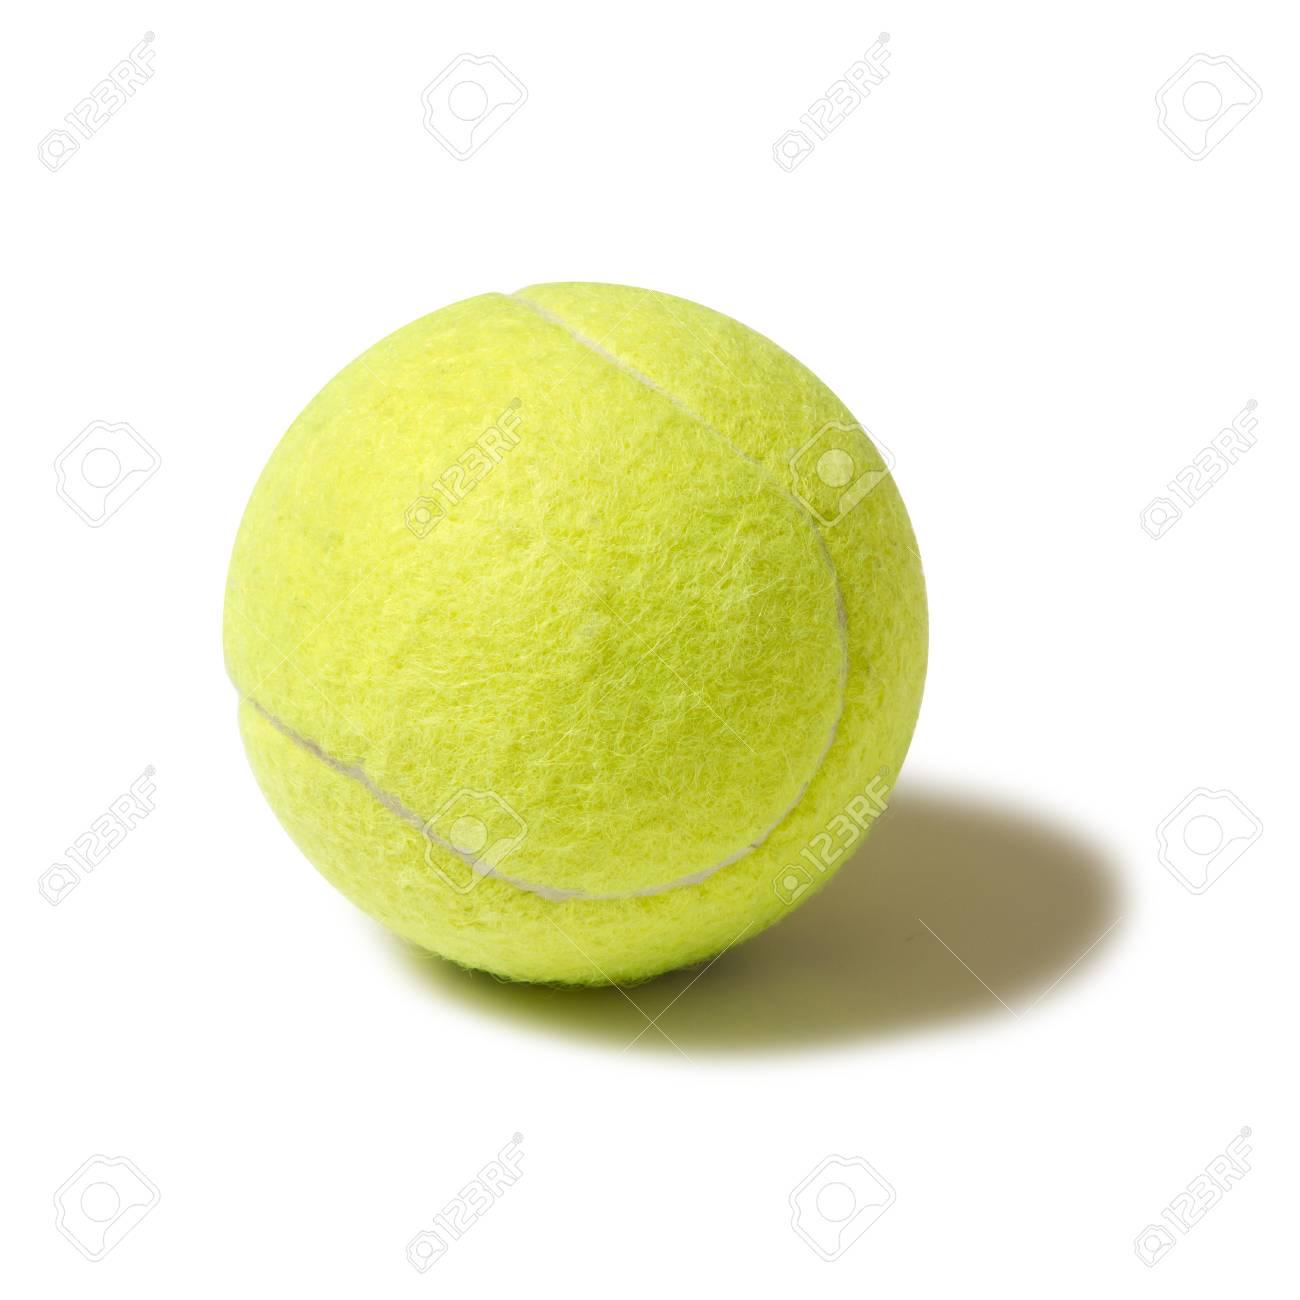 yellow ball tennis - 93771093